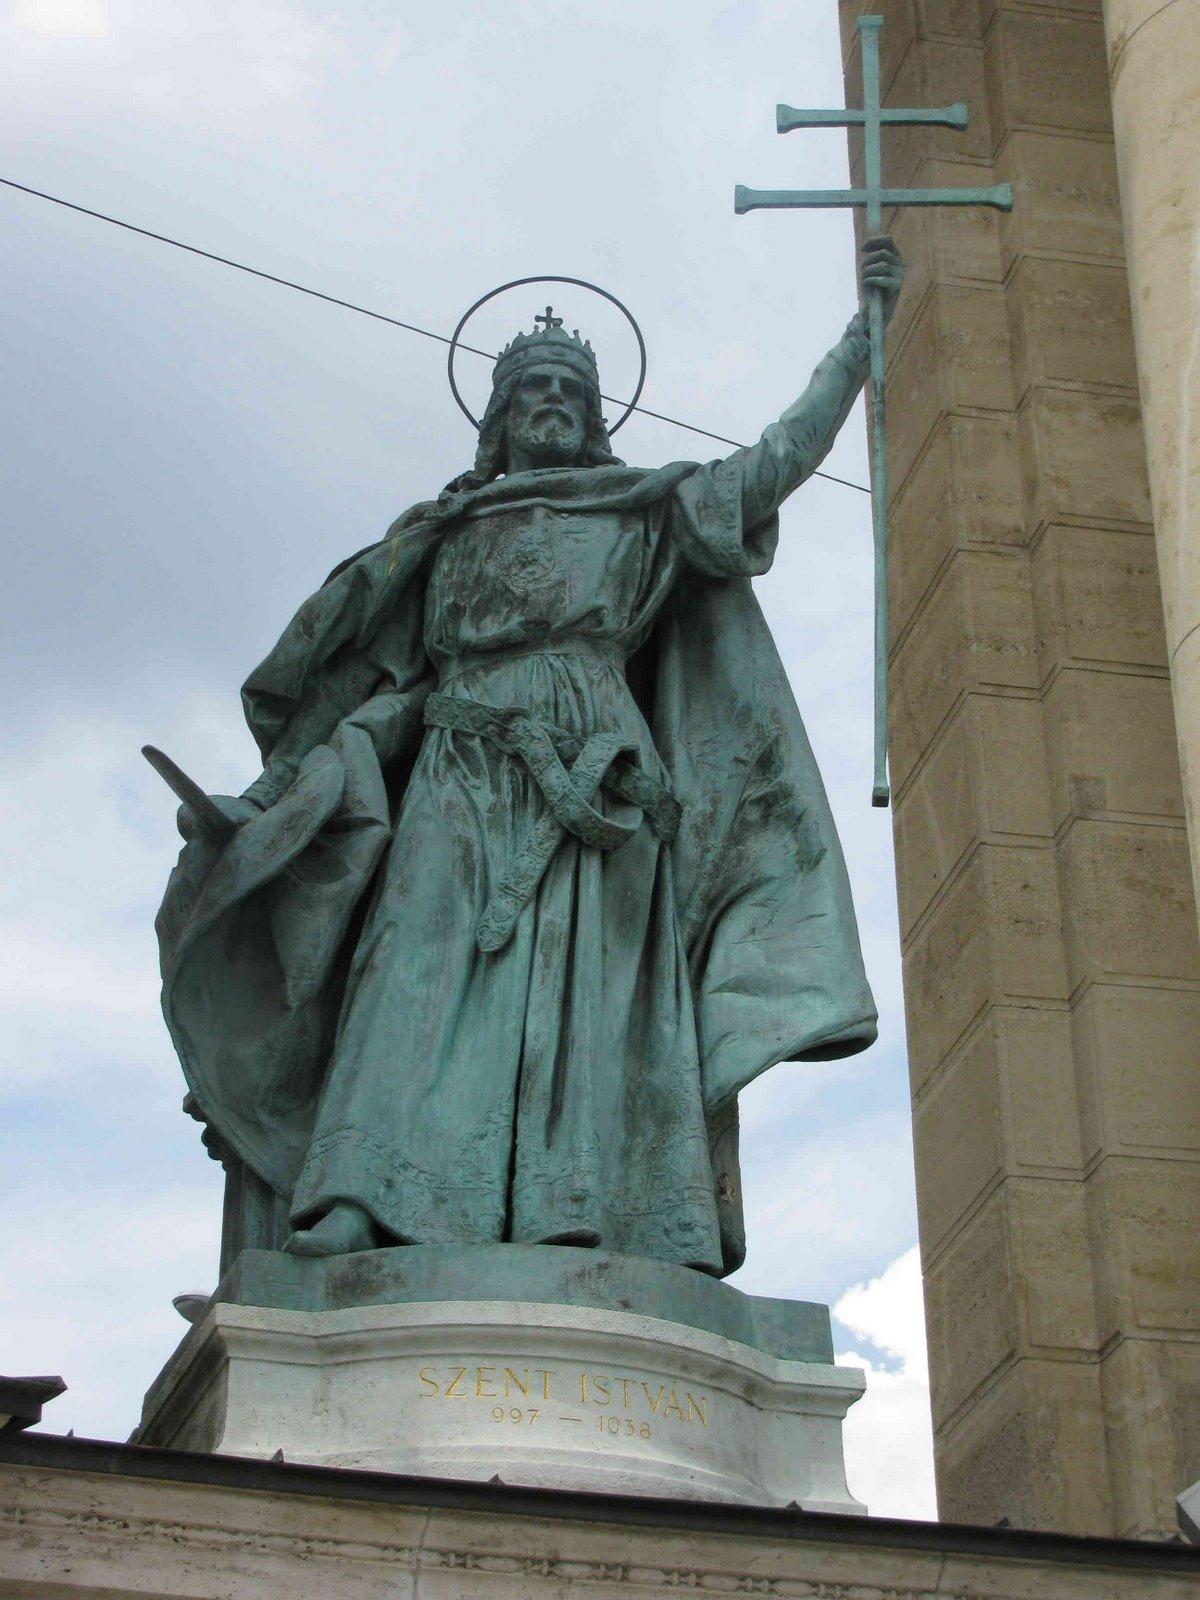 Saint Istvan (Stephen), Hosokter, Budapest, Hungary